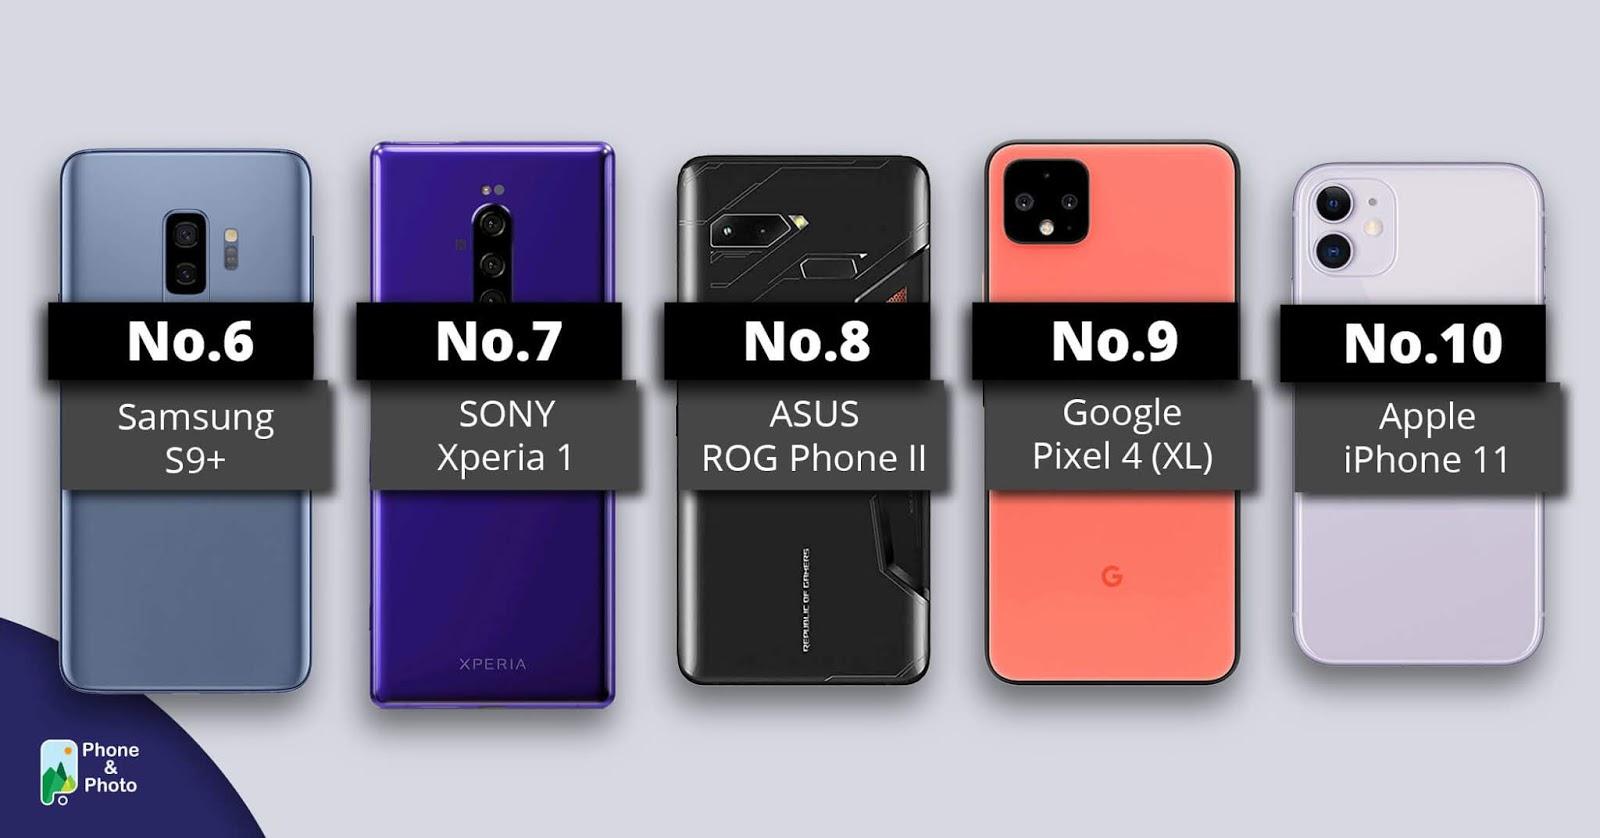 Top 10 Best Camera Phone 2020 Above $500 USD_Top 6~Top 10